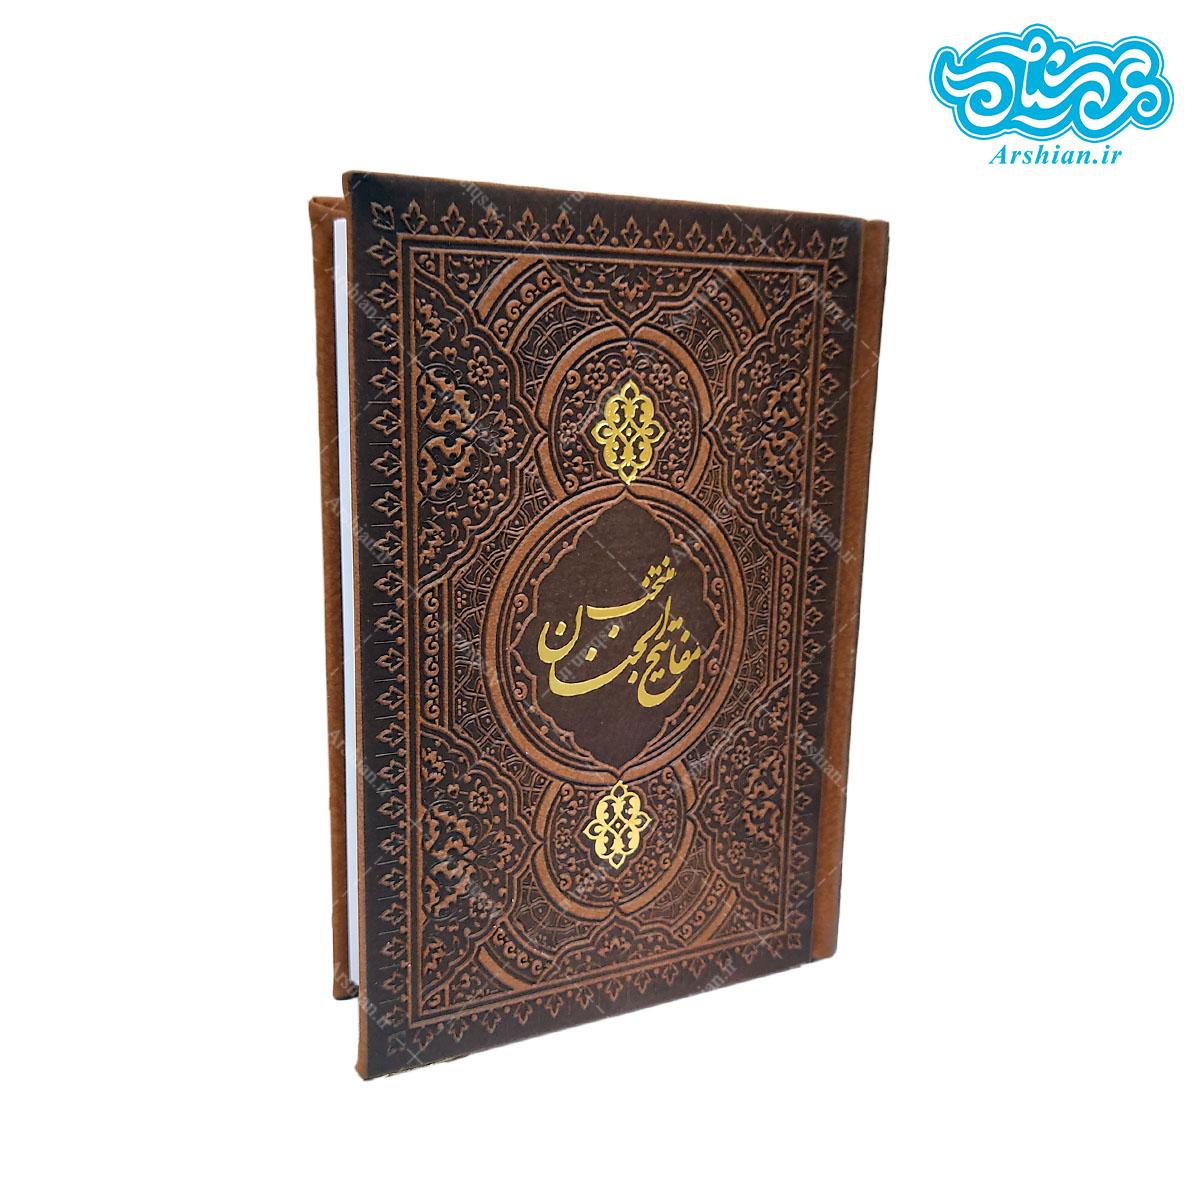 منتخب مفاتیح الجنان جیبی کد 003